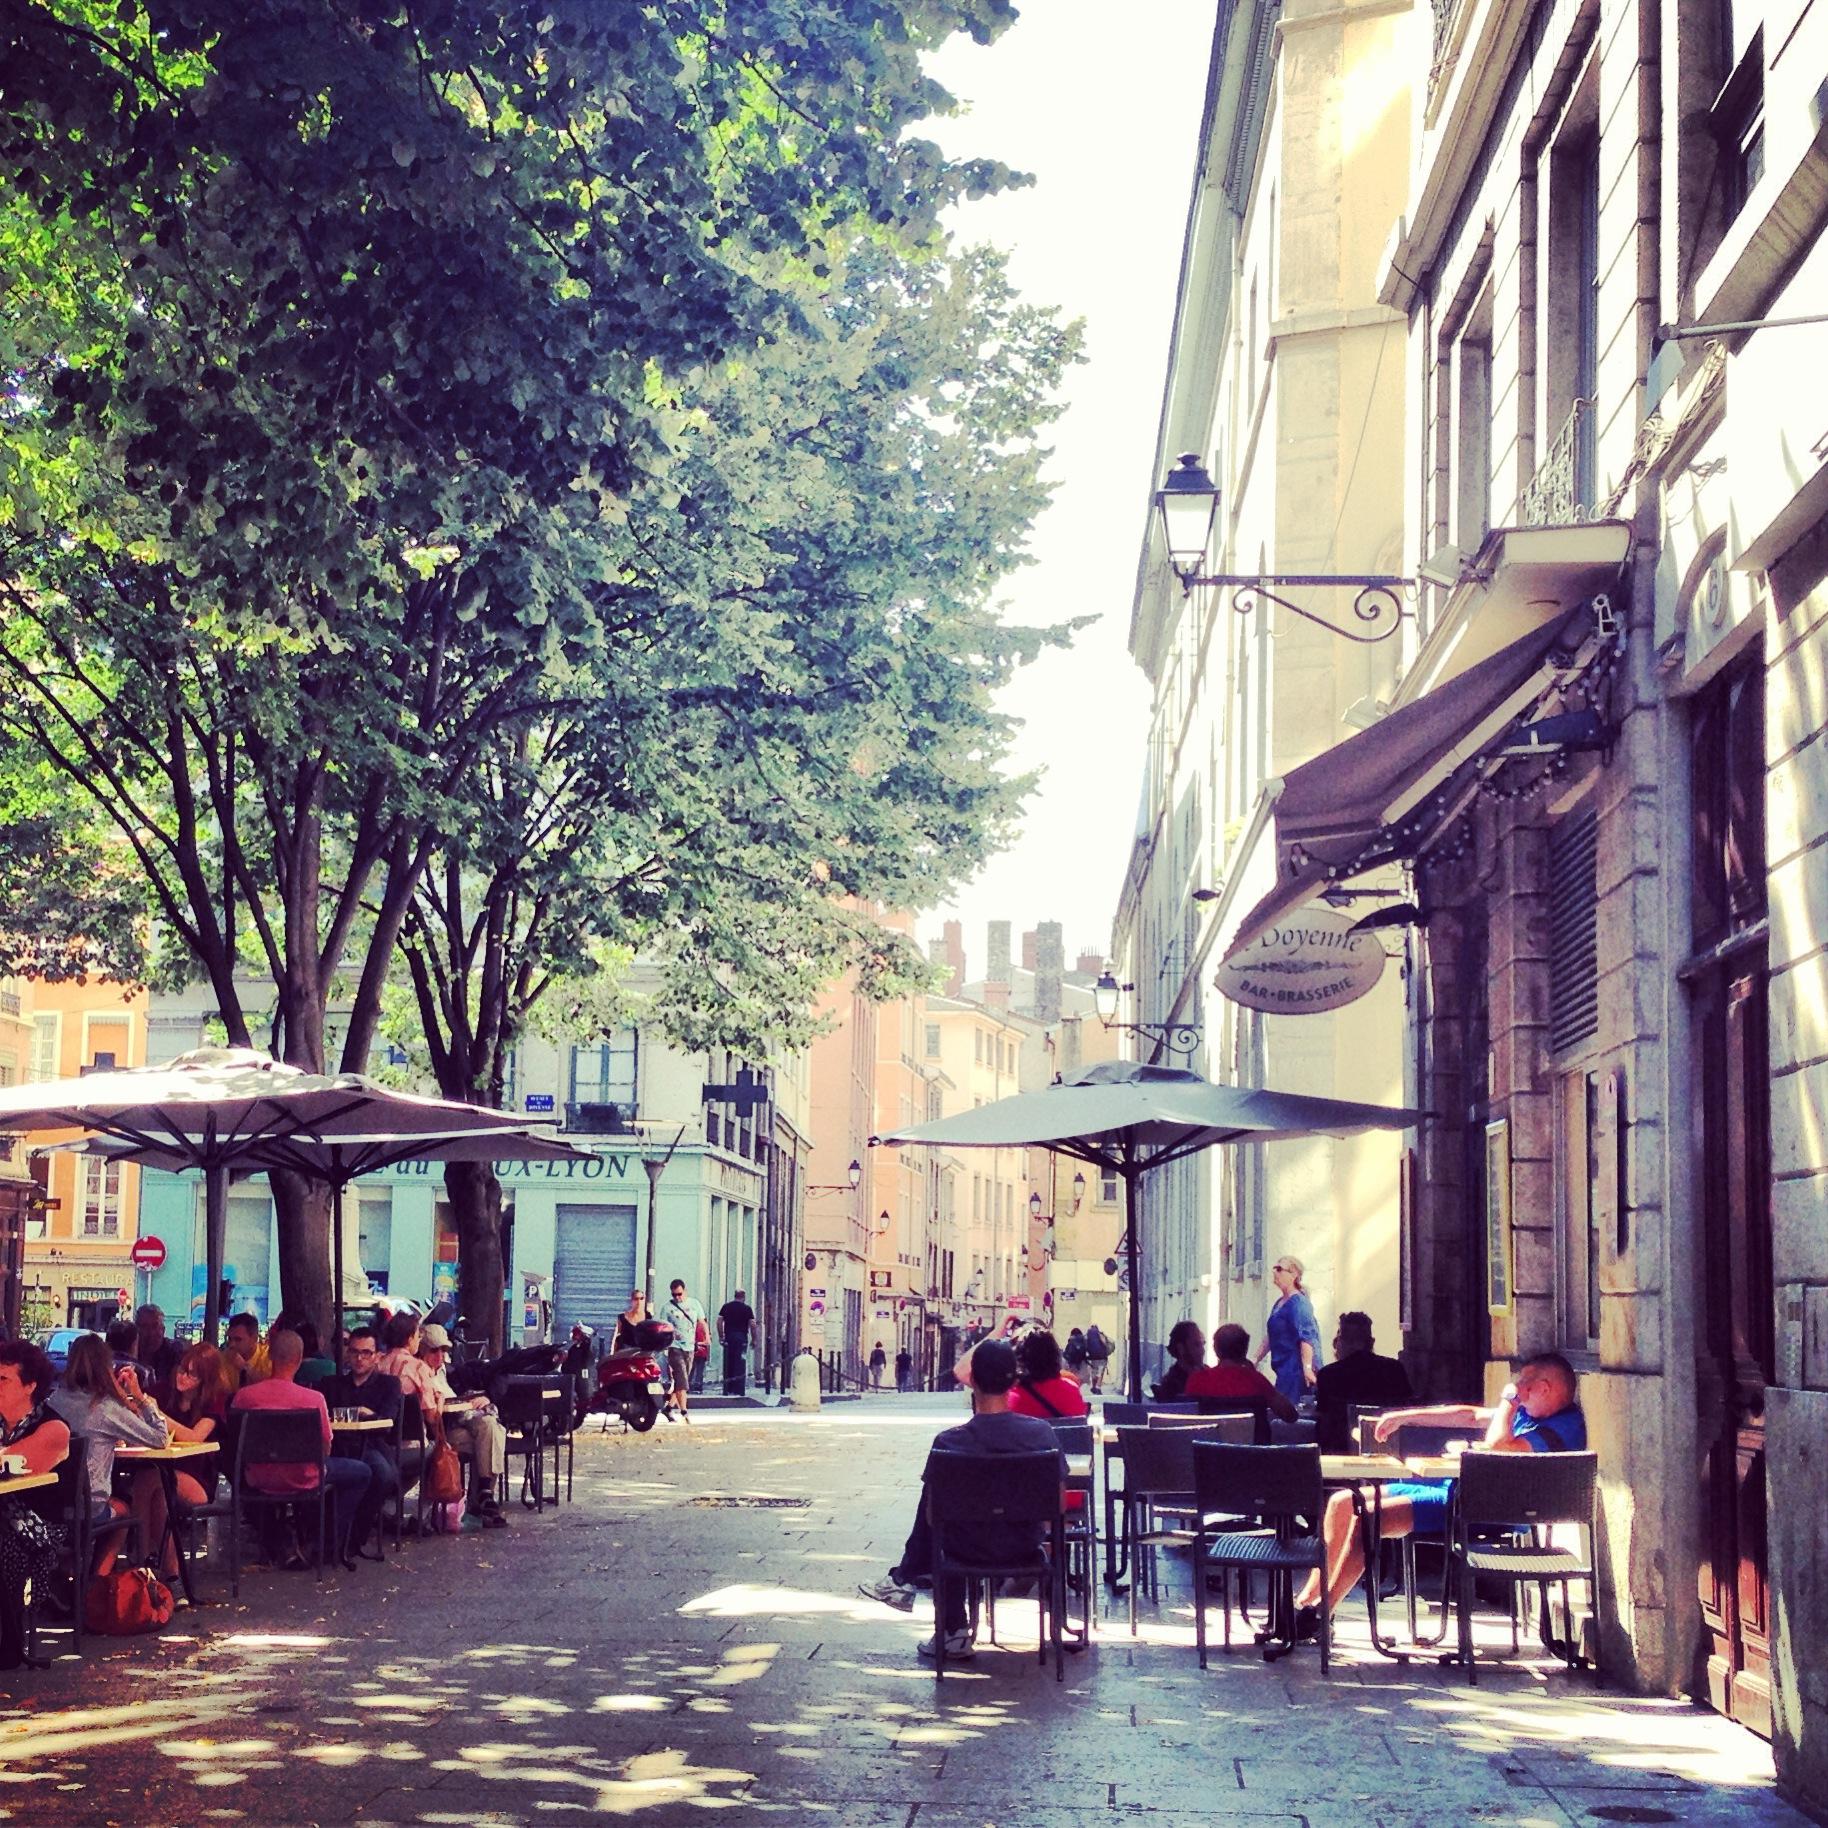 Café, Vieux Lyon